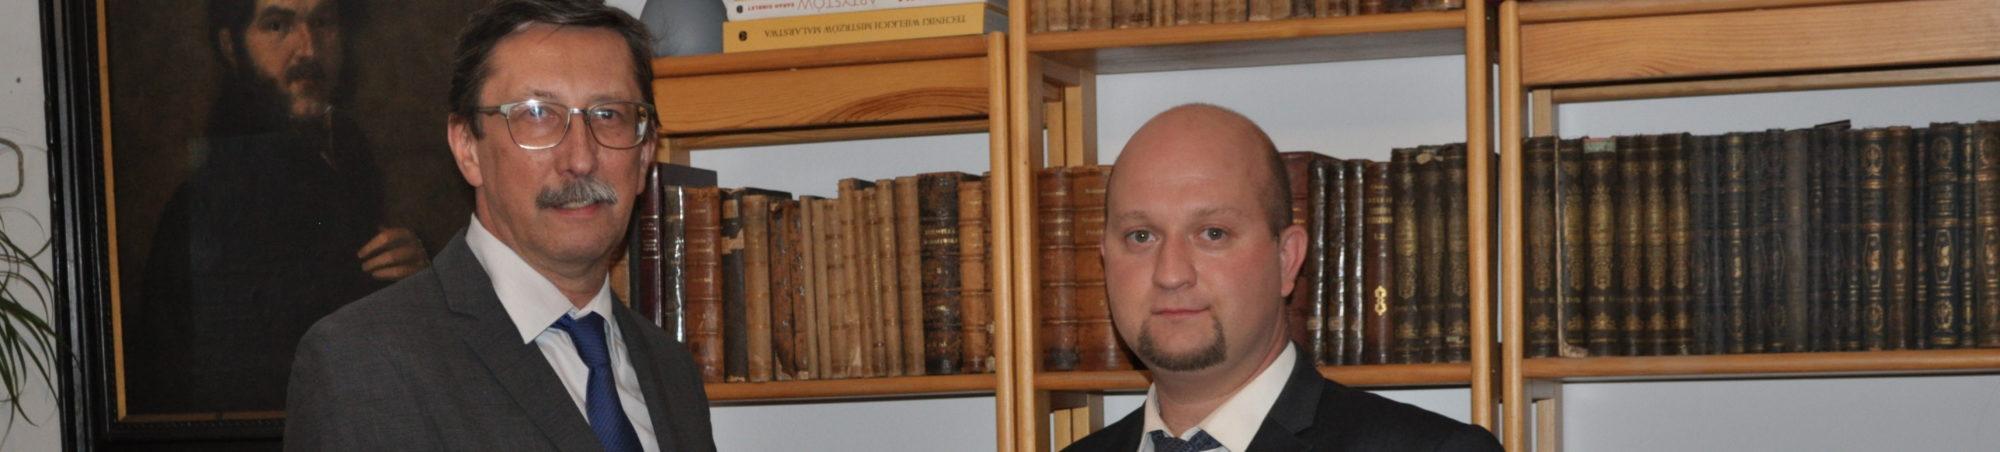 Konrad Michalski - wicestarosta legionowski